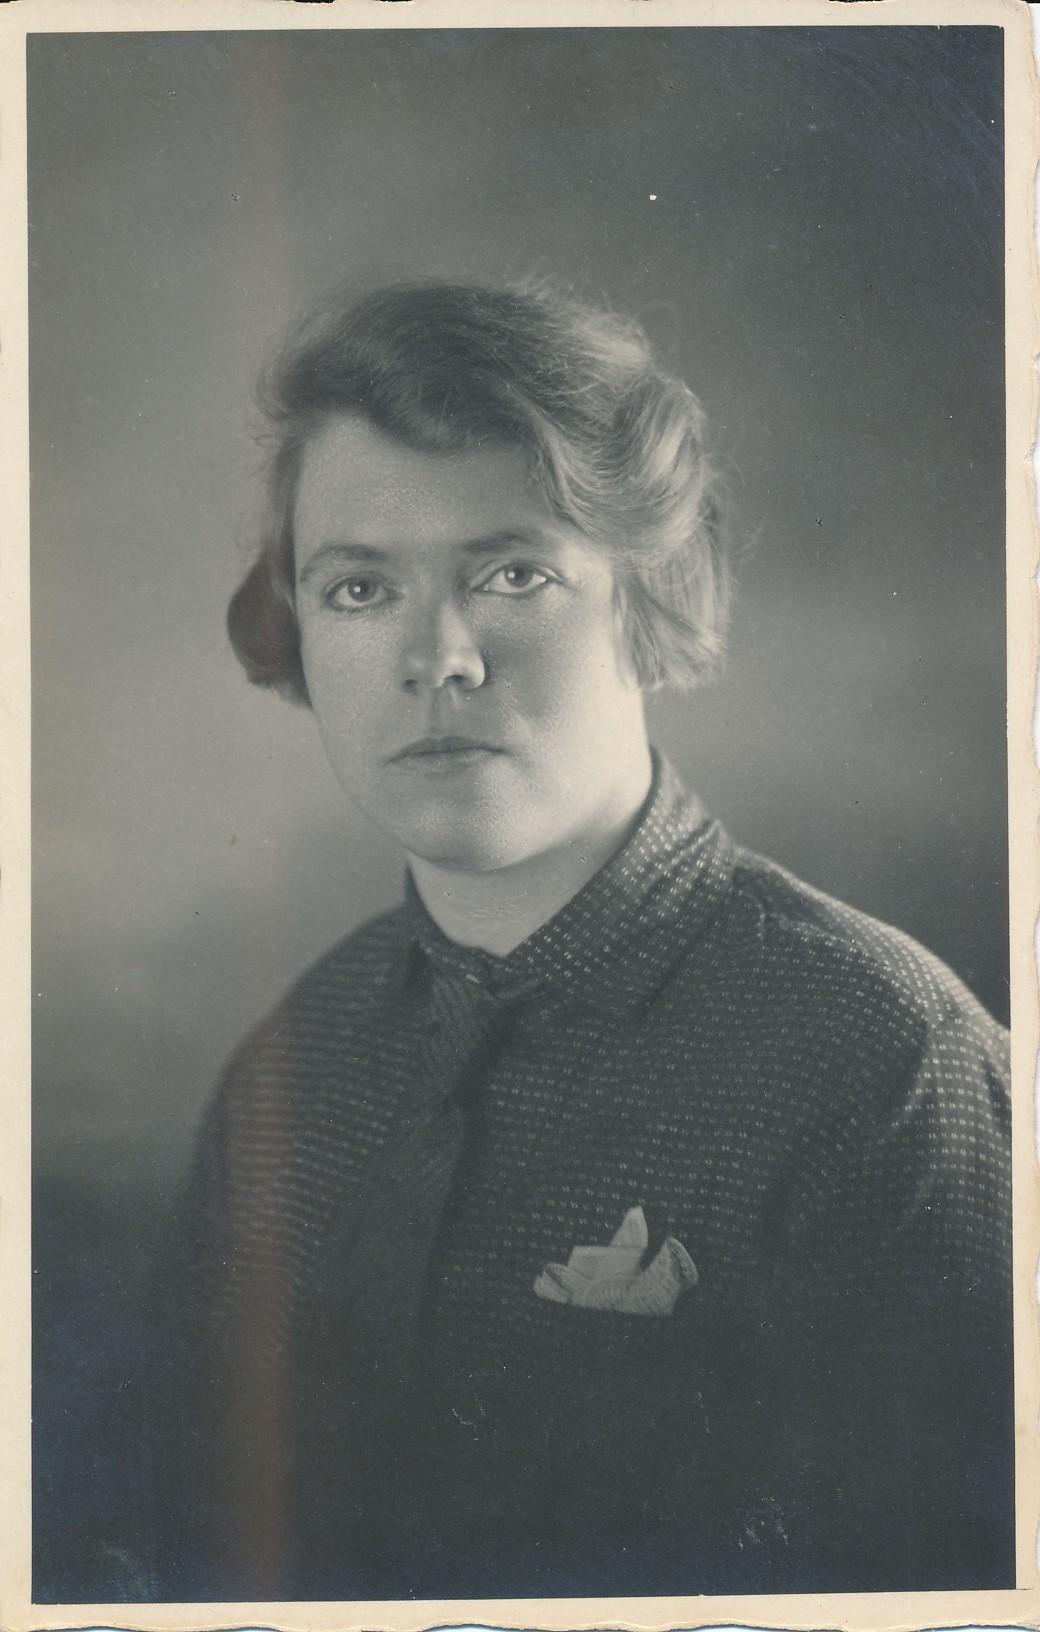 Fotoalbum Andre Kamsma, 129, Hieke Kamsma, 1932